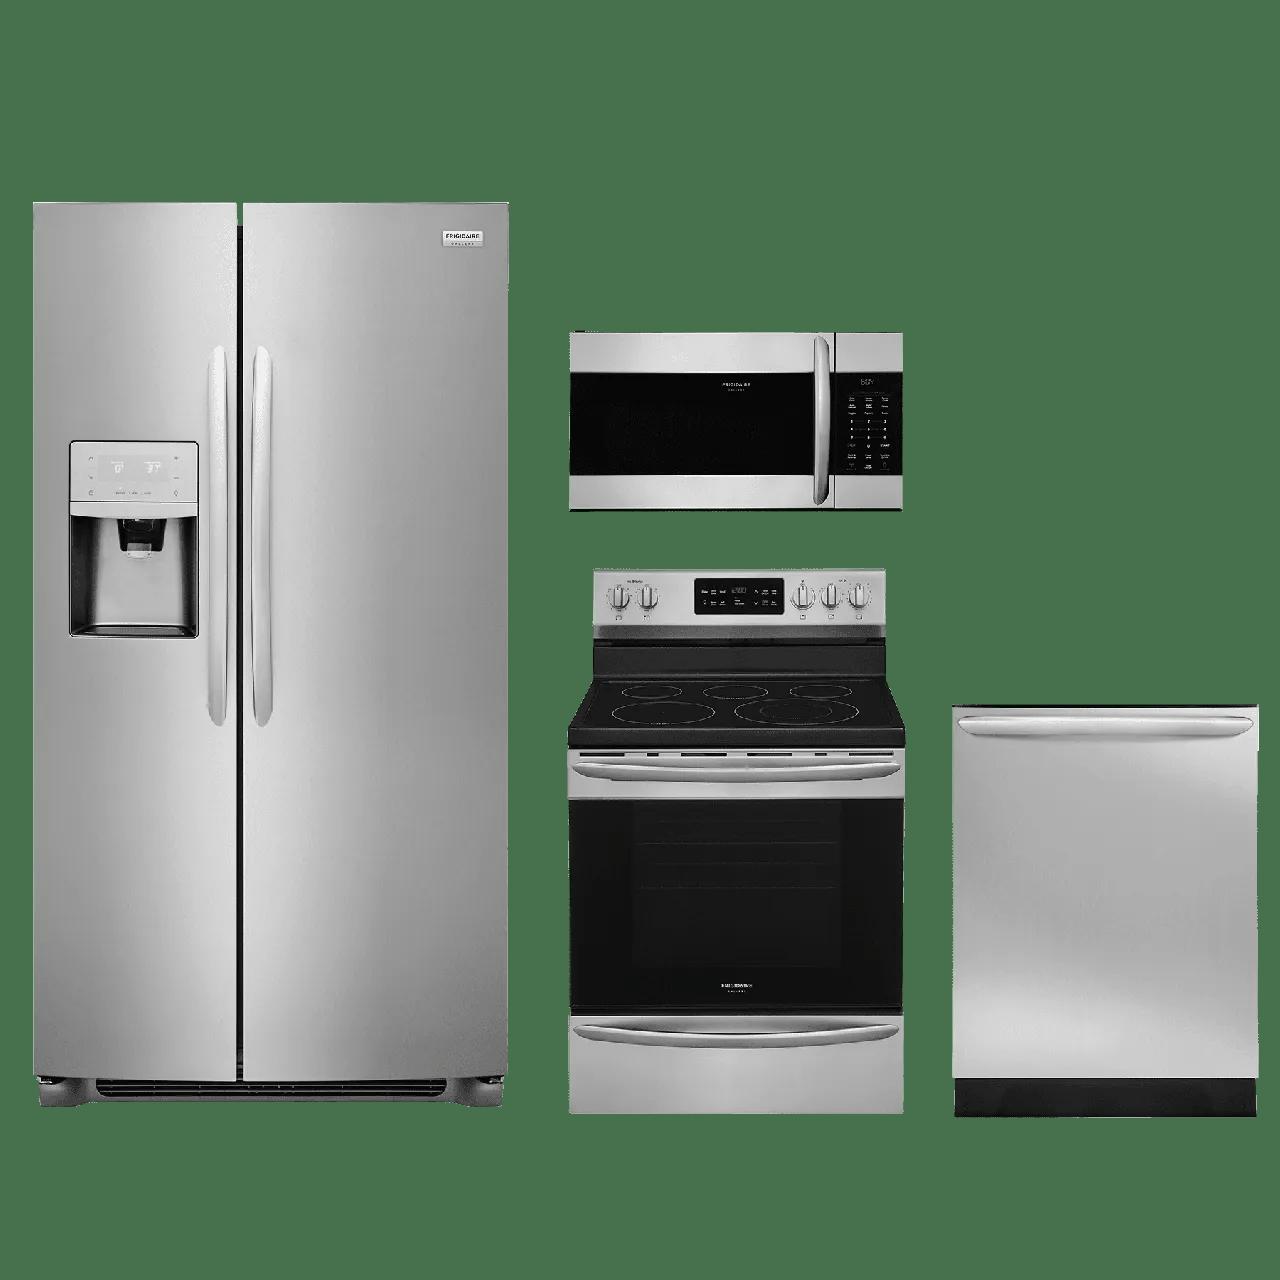 frigidaire kitchen appliances black slate floor tiles gallery appliance packages besto blog